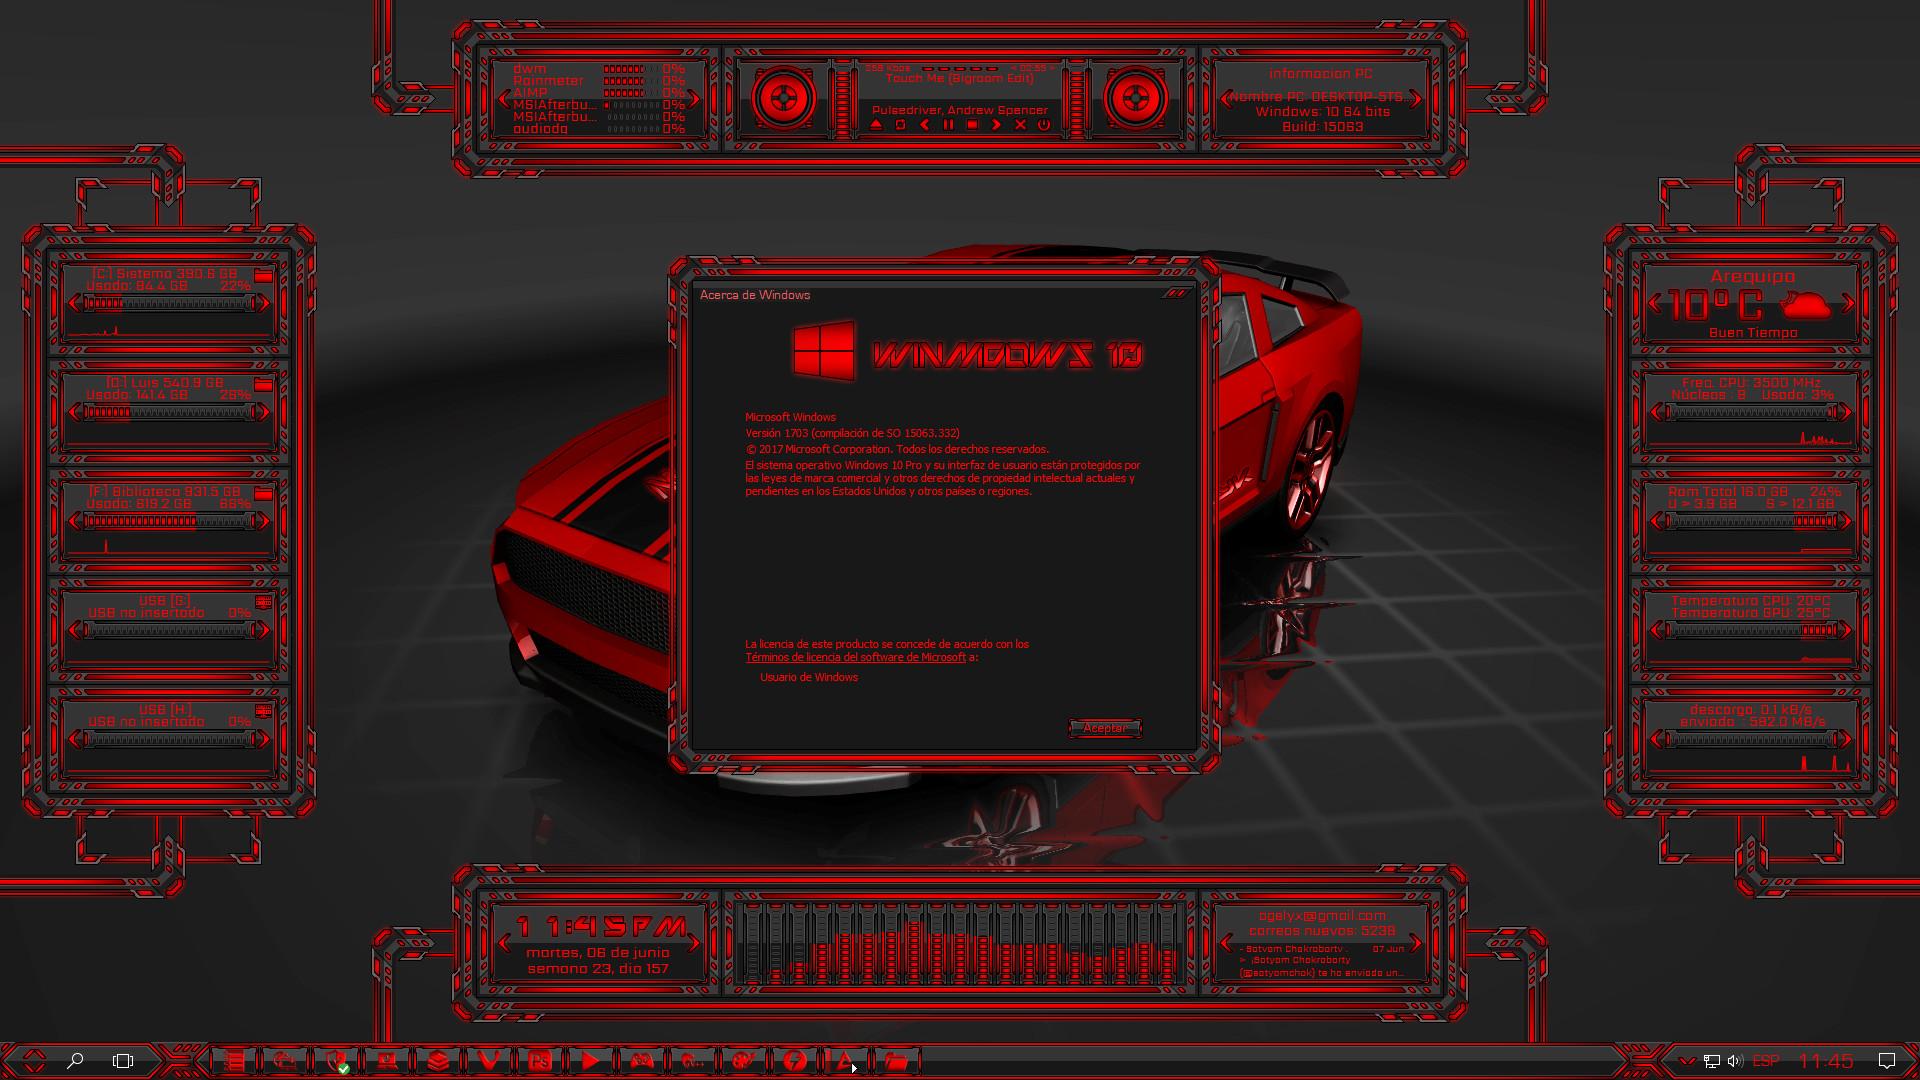 My World RED 2.0 for Windows 10 Creators Update >